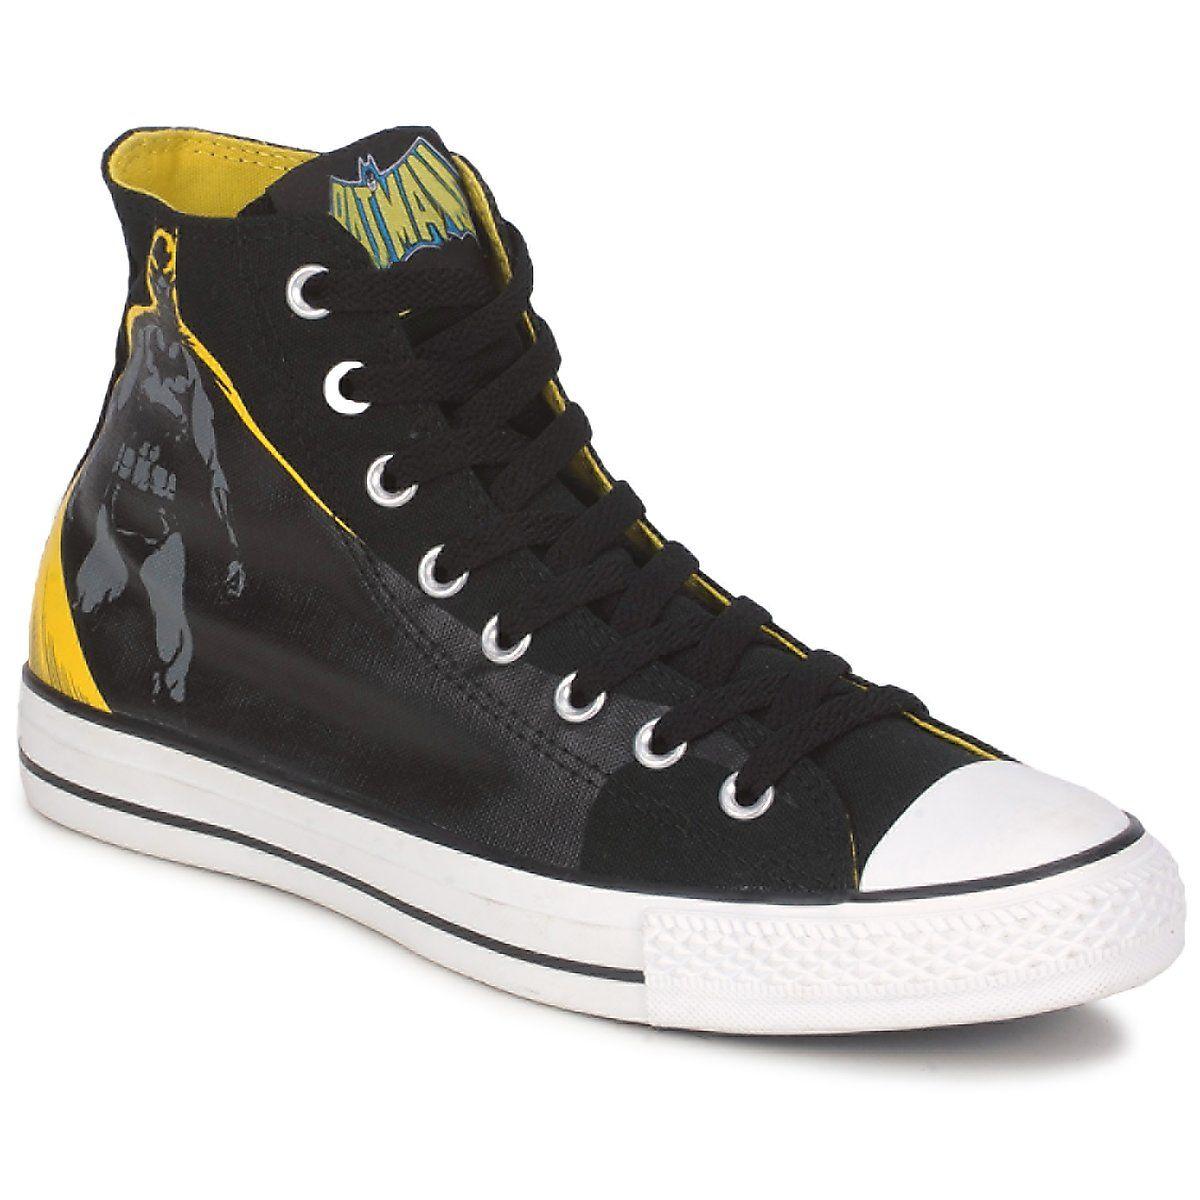 Reportero brindis Influencia  Nuna nuna nuna nuna nuna nuna NUNAA.... BATMAN!   Converse, Womens converse,  Converse chuck taylor high top sneaker